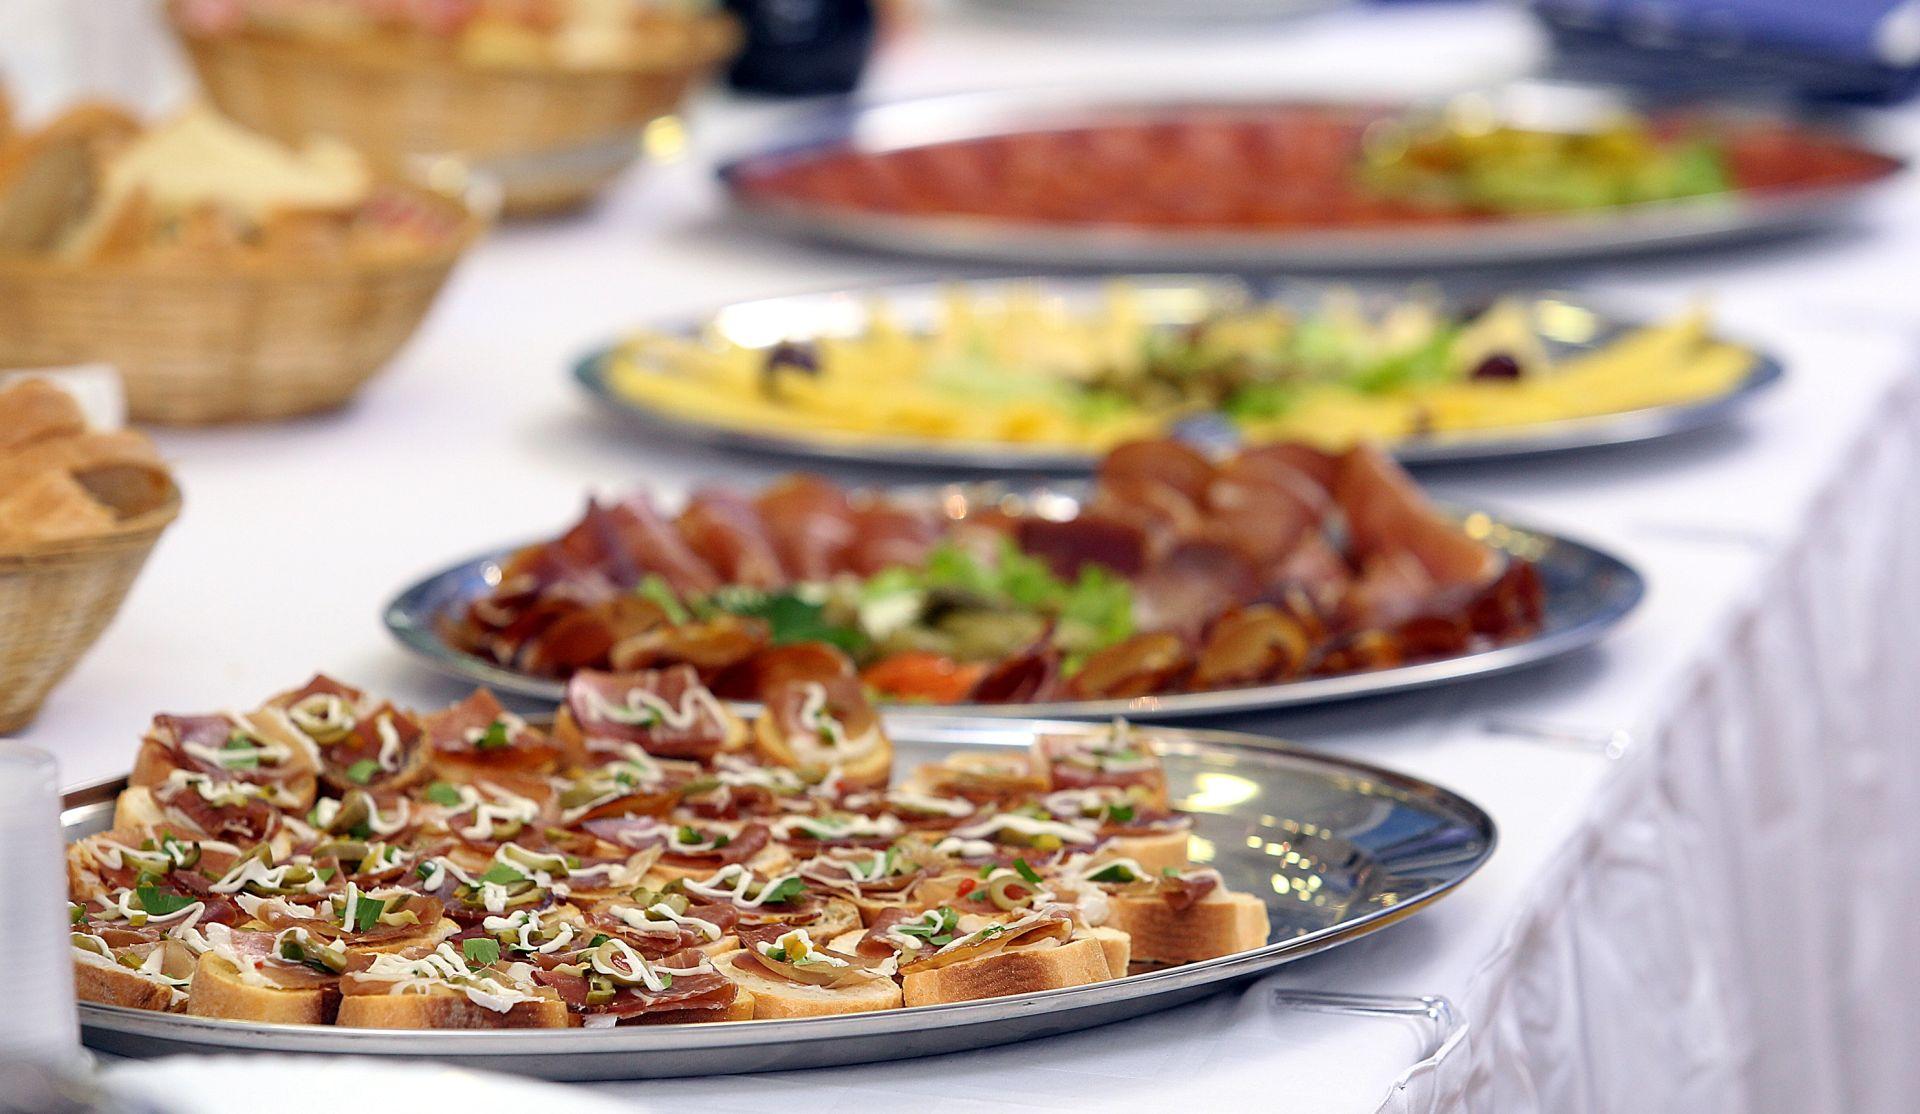 Velpro sudjelovao na međunarodnom festivalu Grand Gourmet